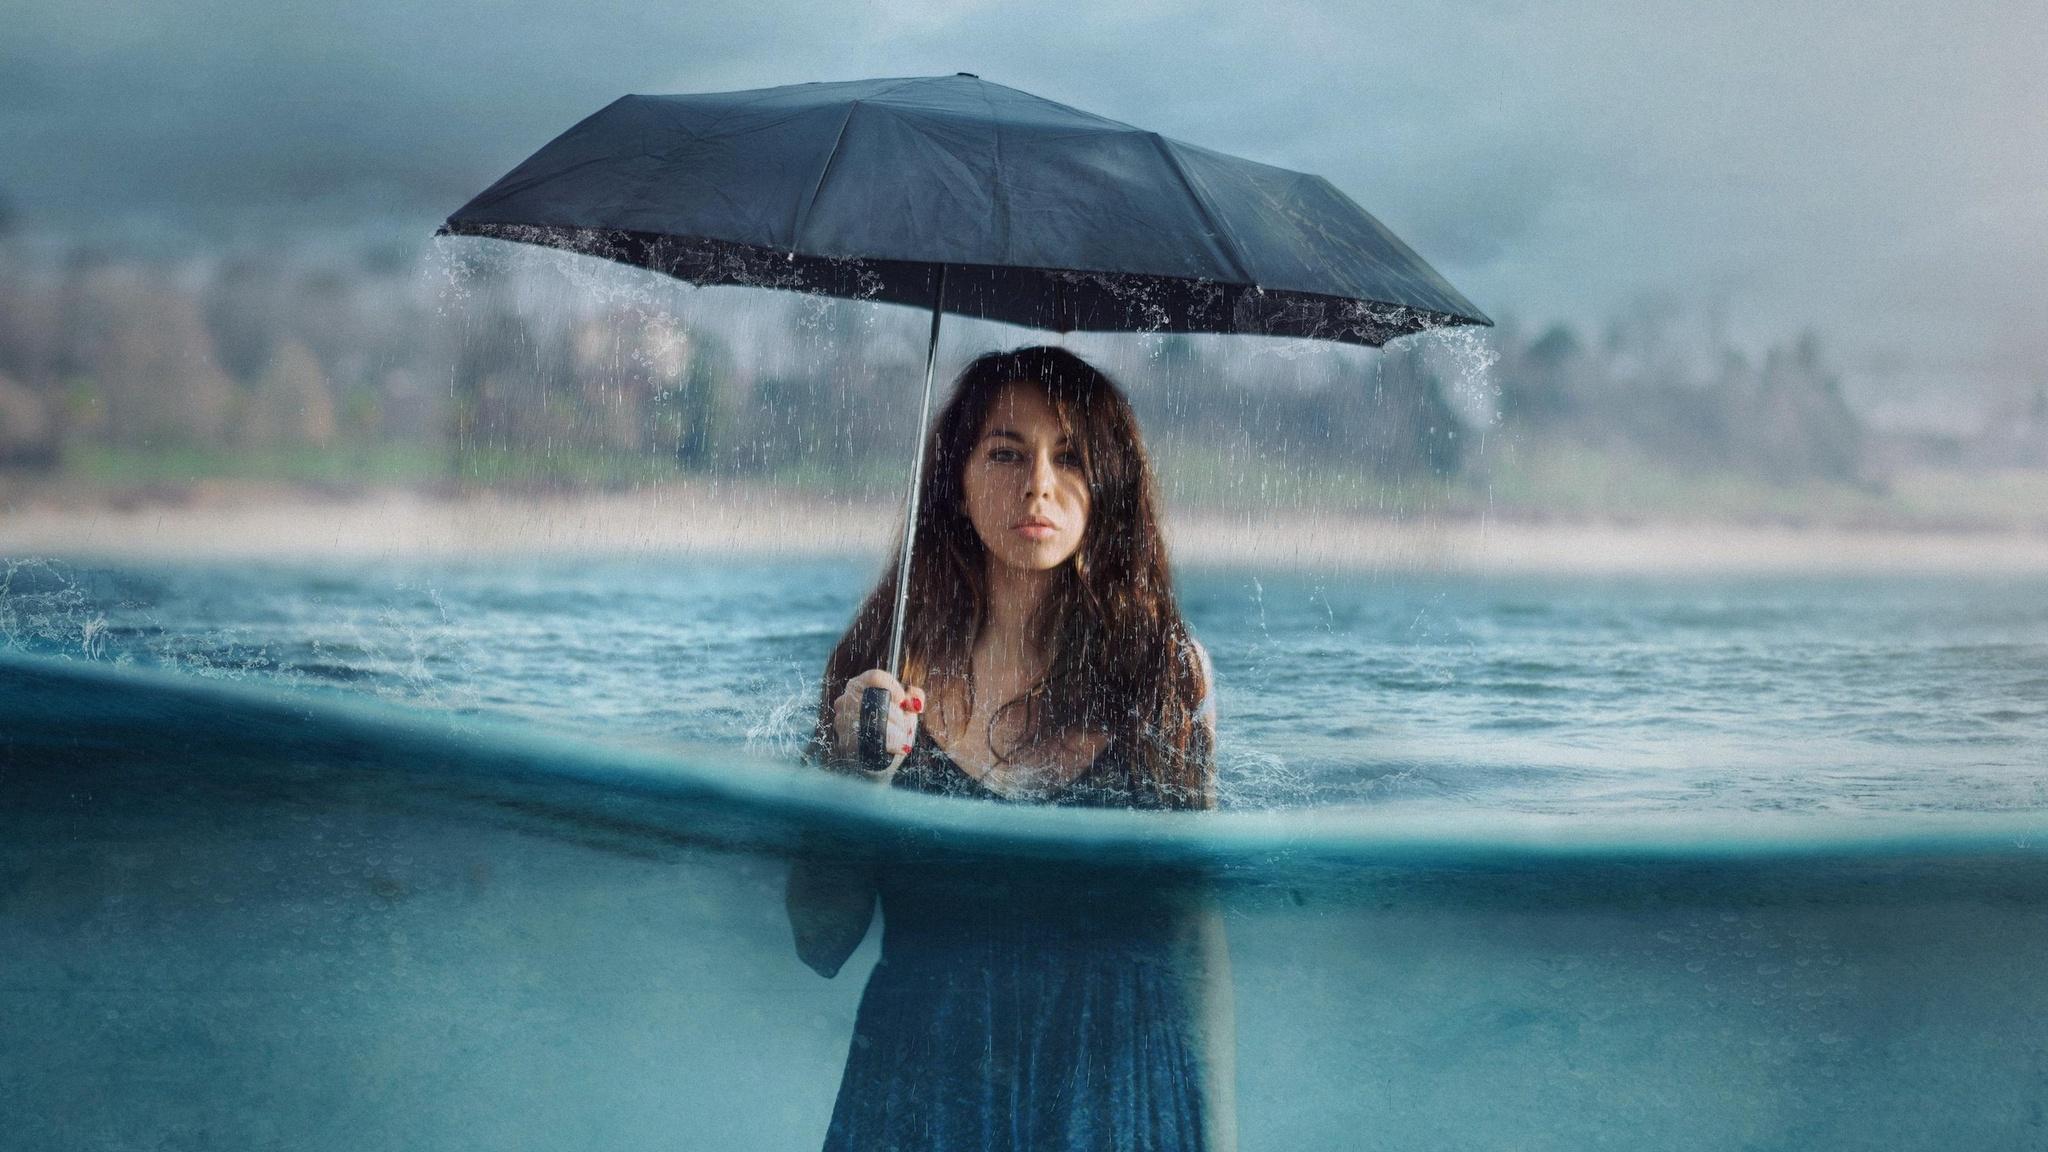 2048x1152 Photography Manipulation Umbrella Girl Women